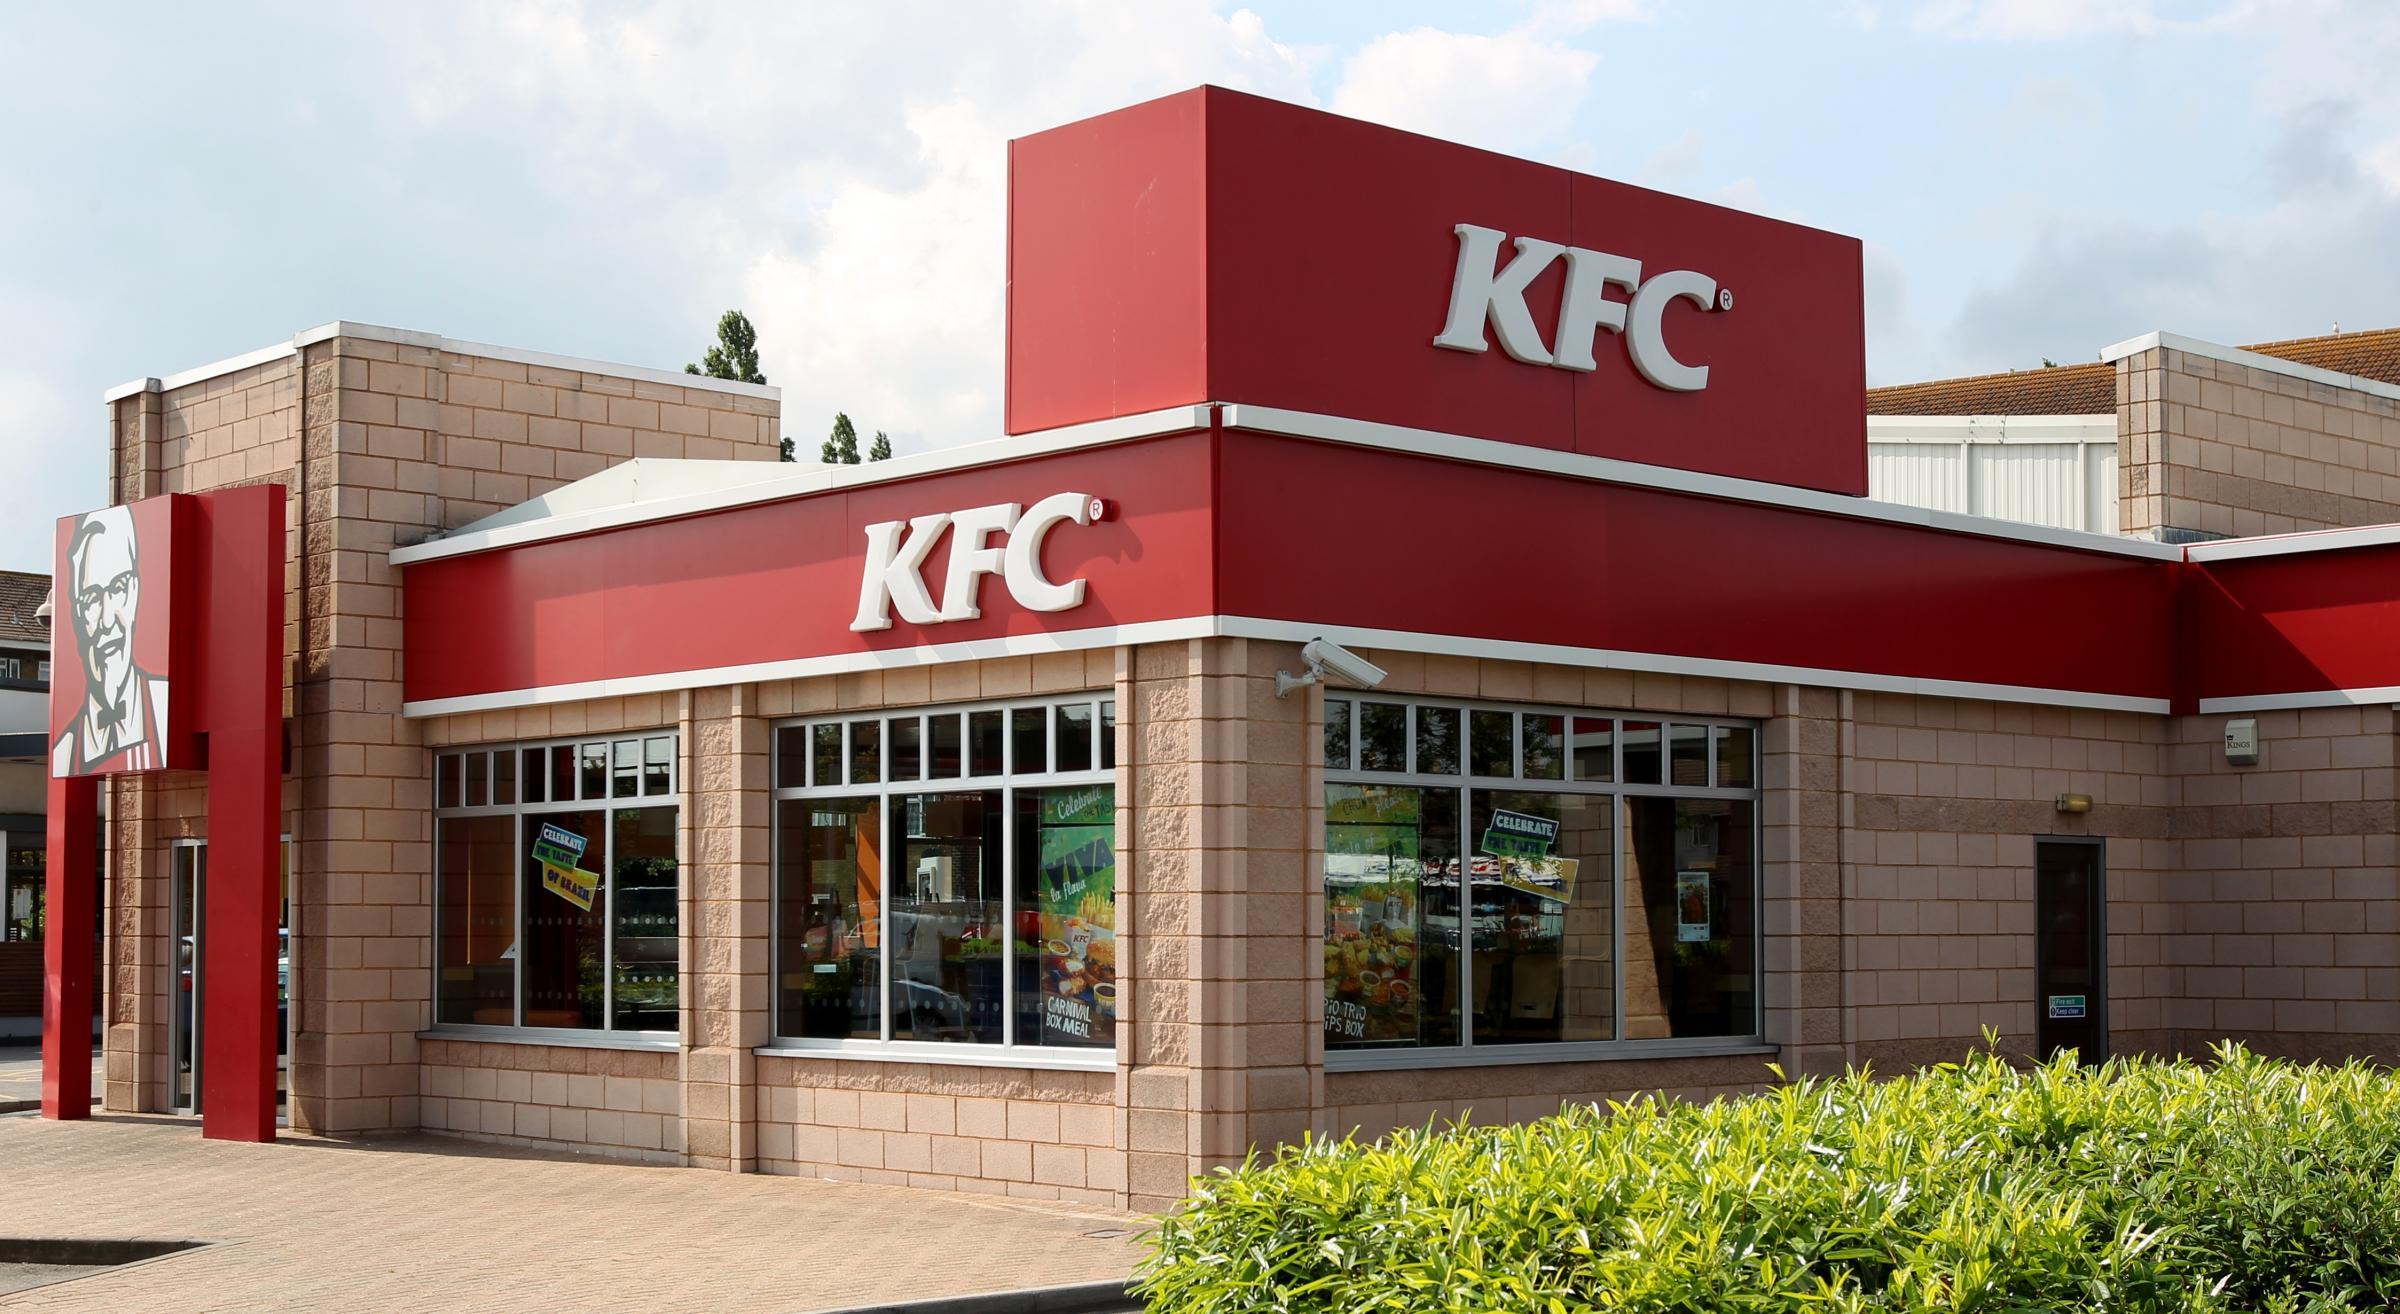 KFC restaurant in Millbrook, Southampton, set for revamp - Daily Echo